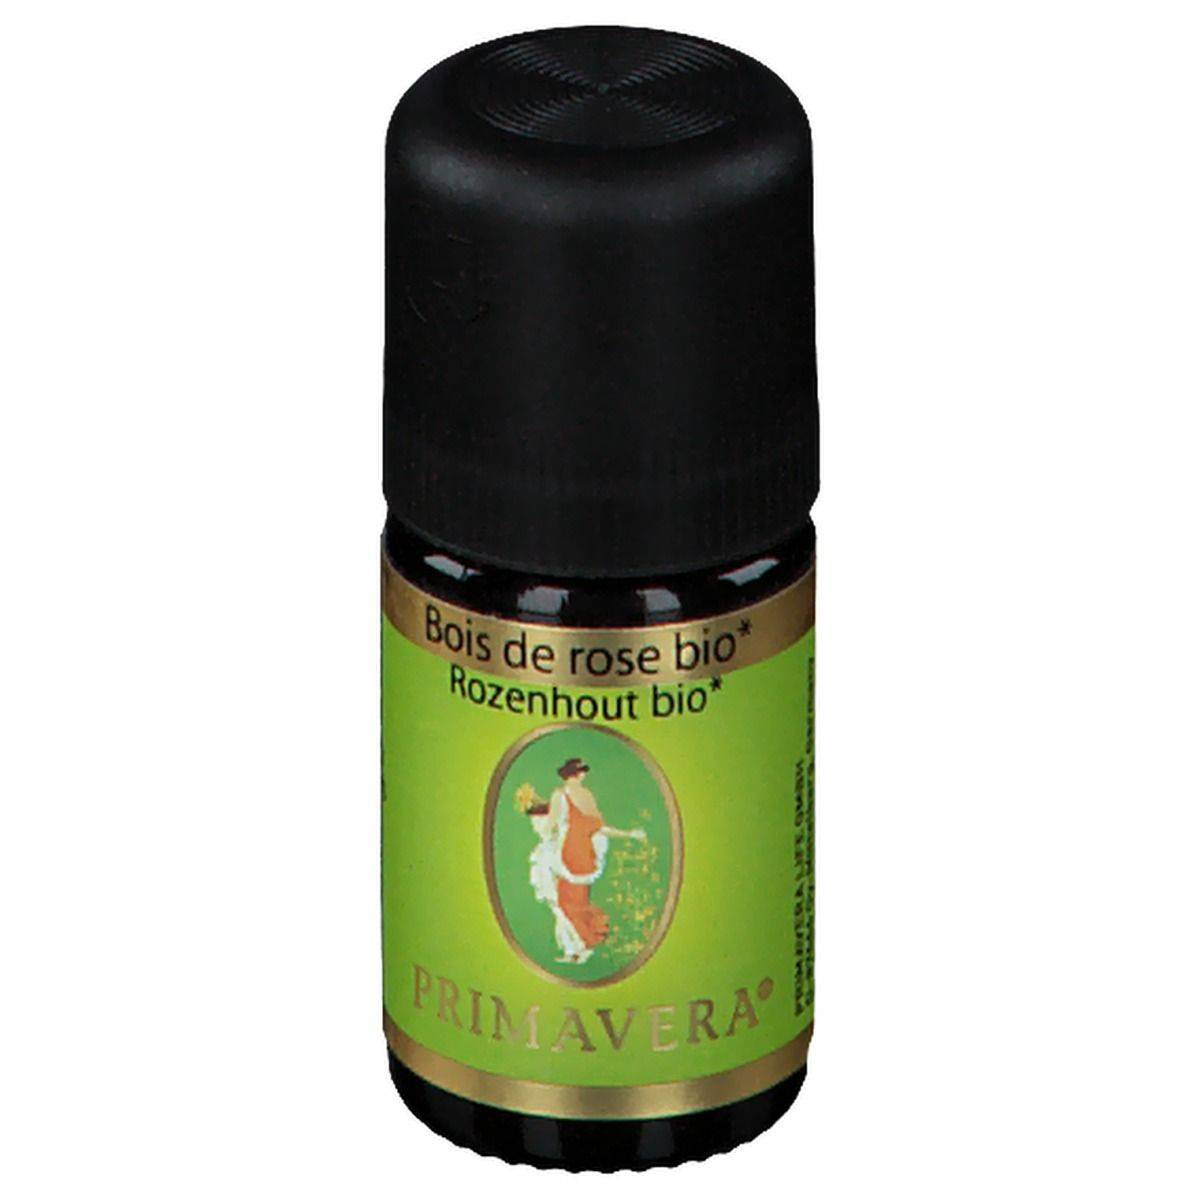 Primavera® Bois de rose Huile essentielle Bio ml huile